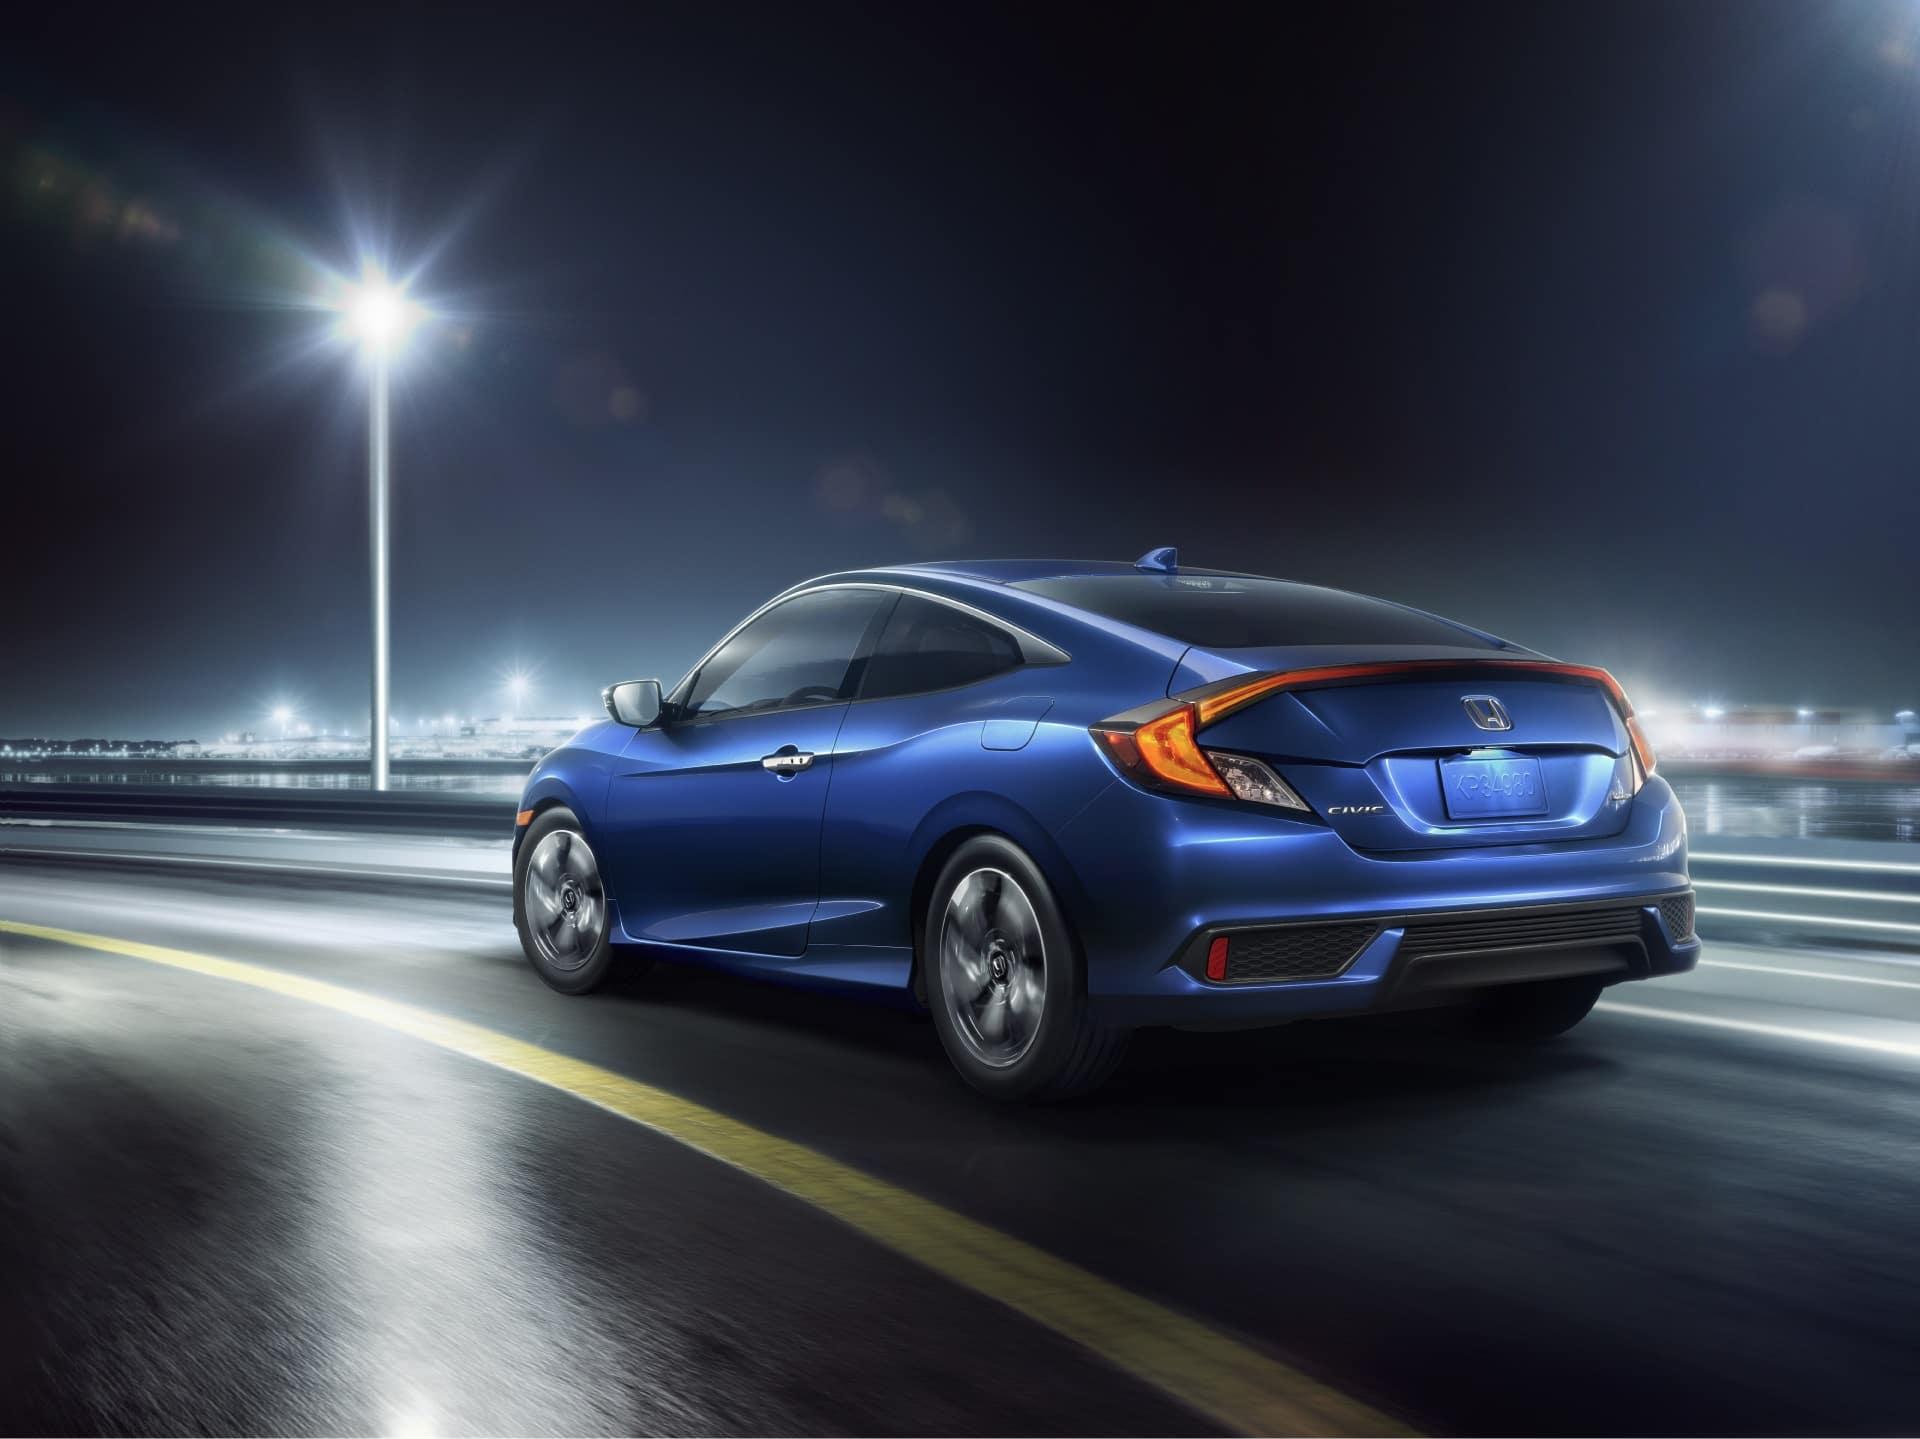 Honda Civic Driving Technology